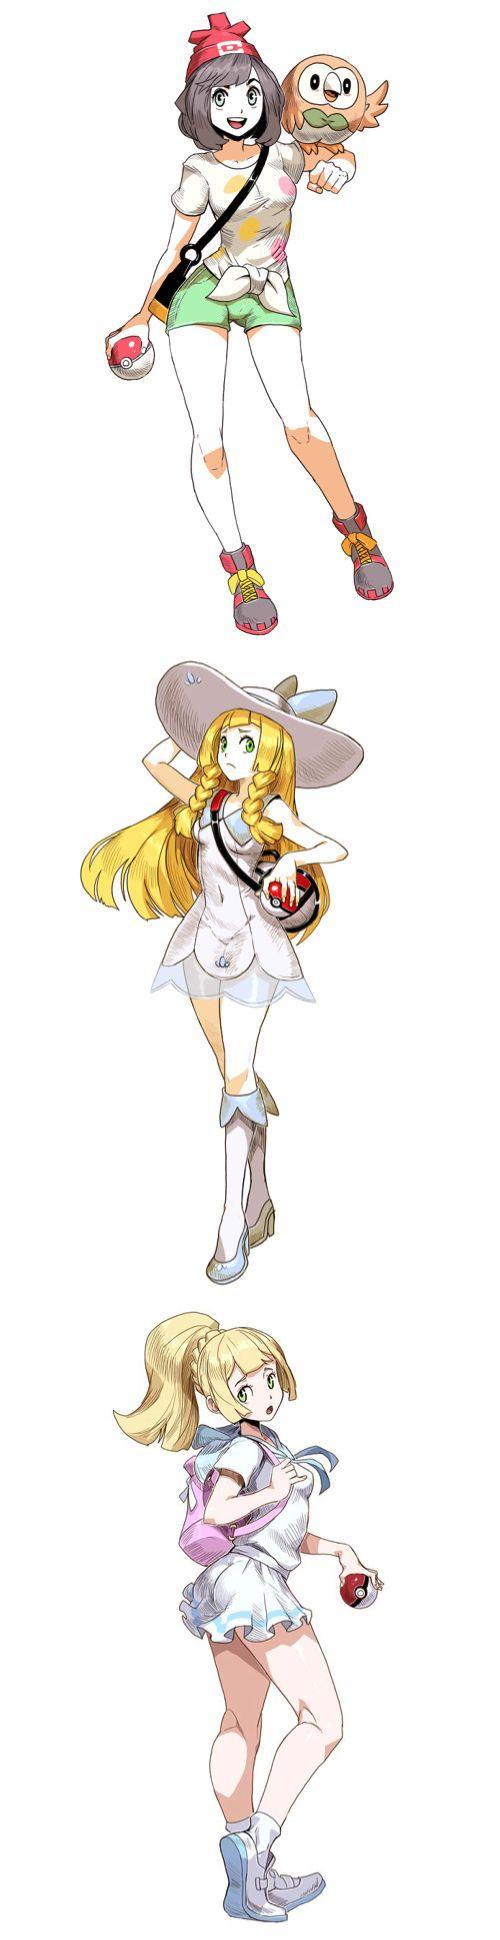 Pokemon trainers from sun and moon... Pokemon girls